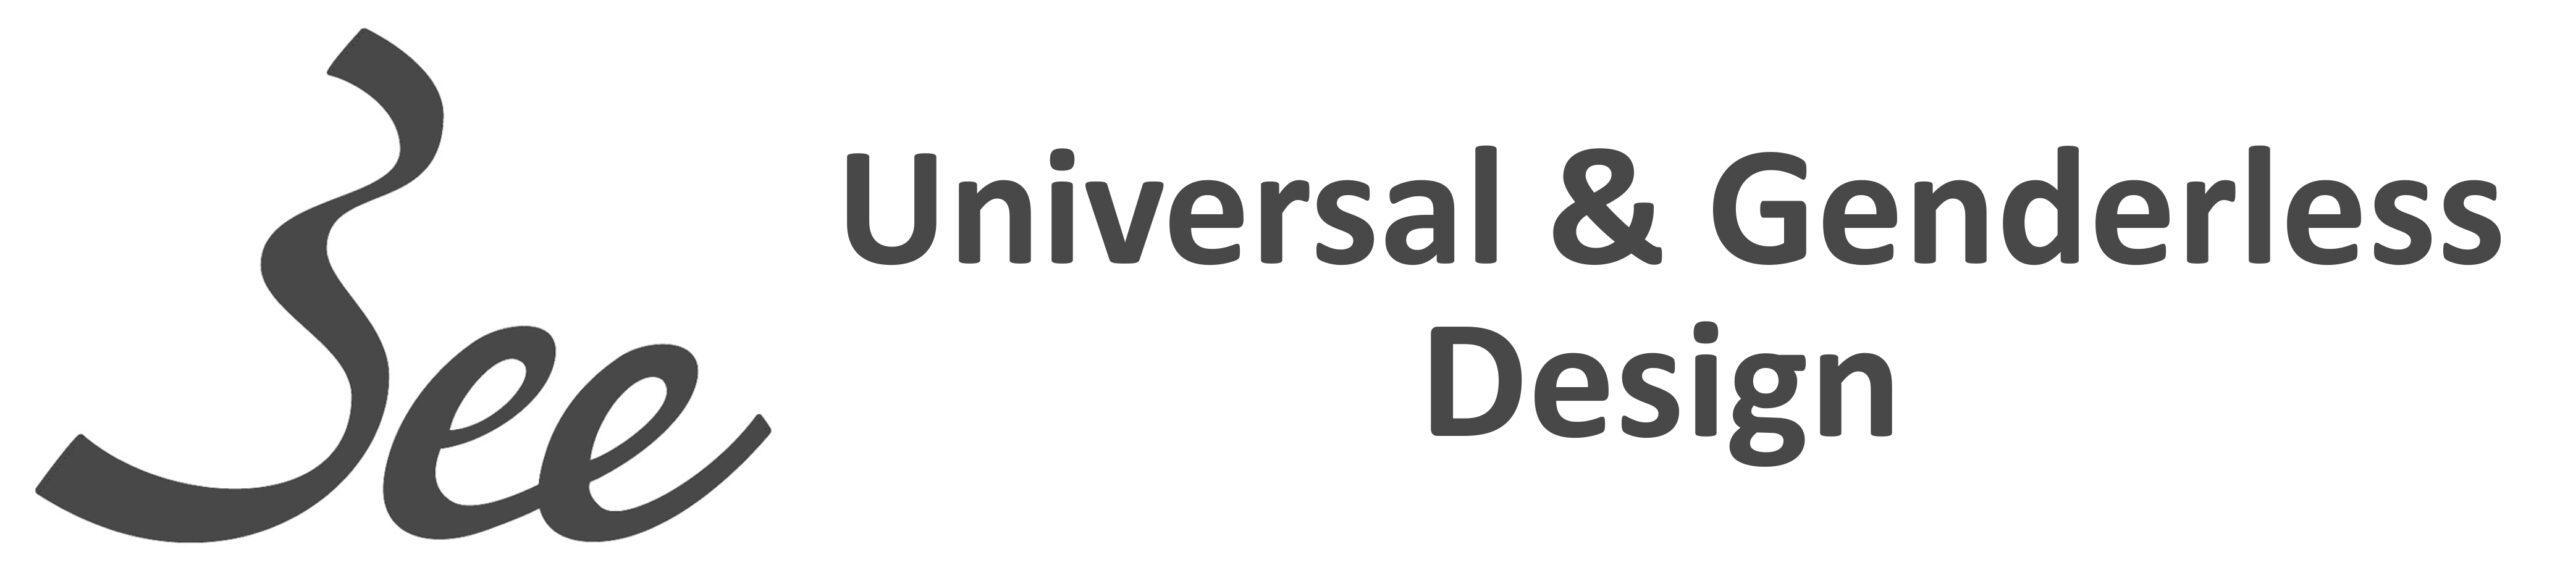 3ee(スリー)イヤホンブランド Universal & Genderless Design